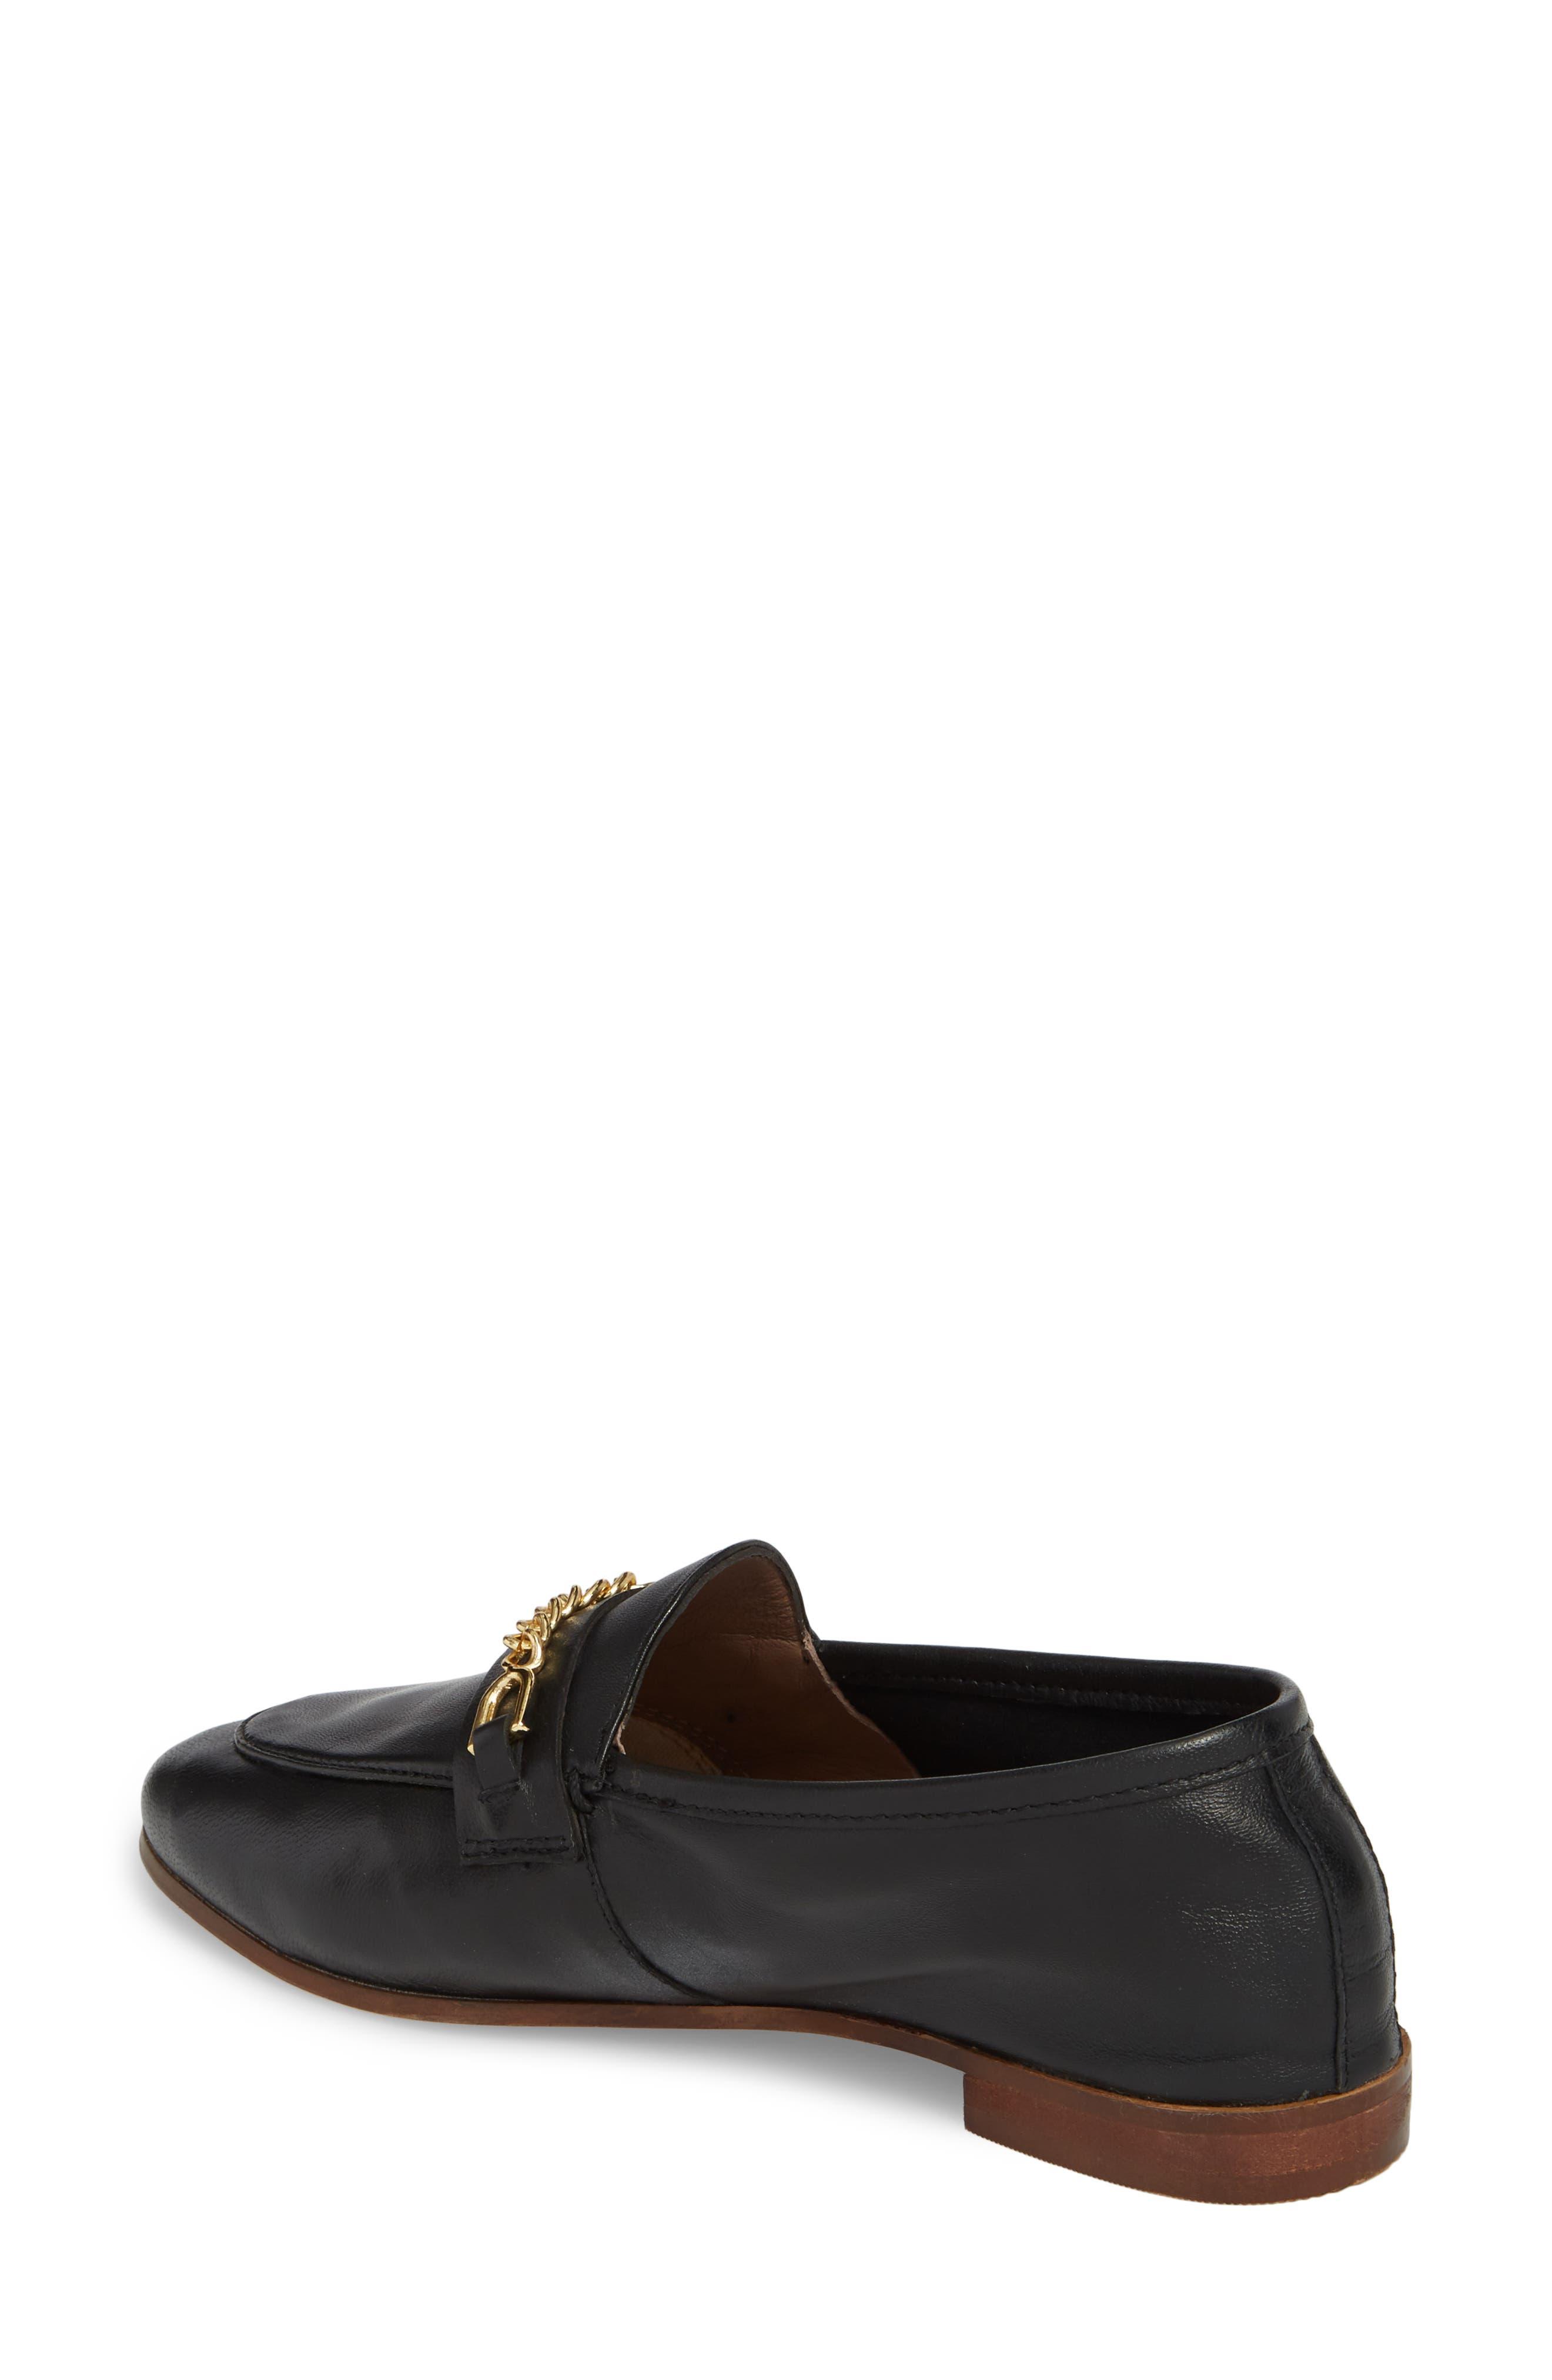 Chain Trim Apron Toe Loafer,                             Alternate thumbnail 2, color,                             Black